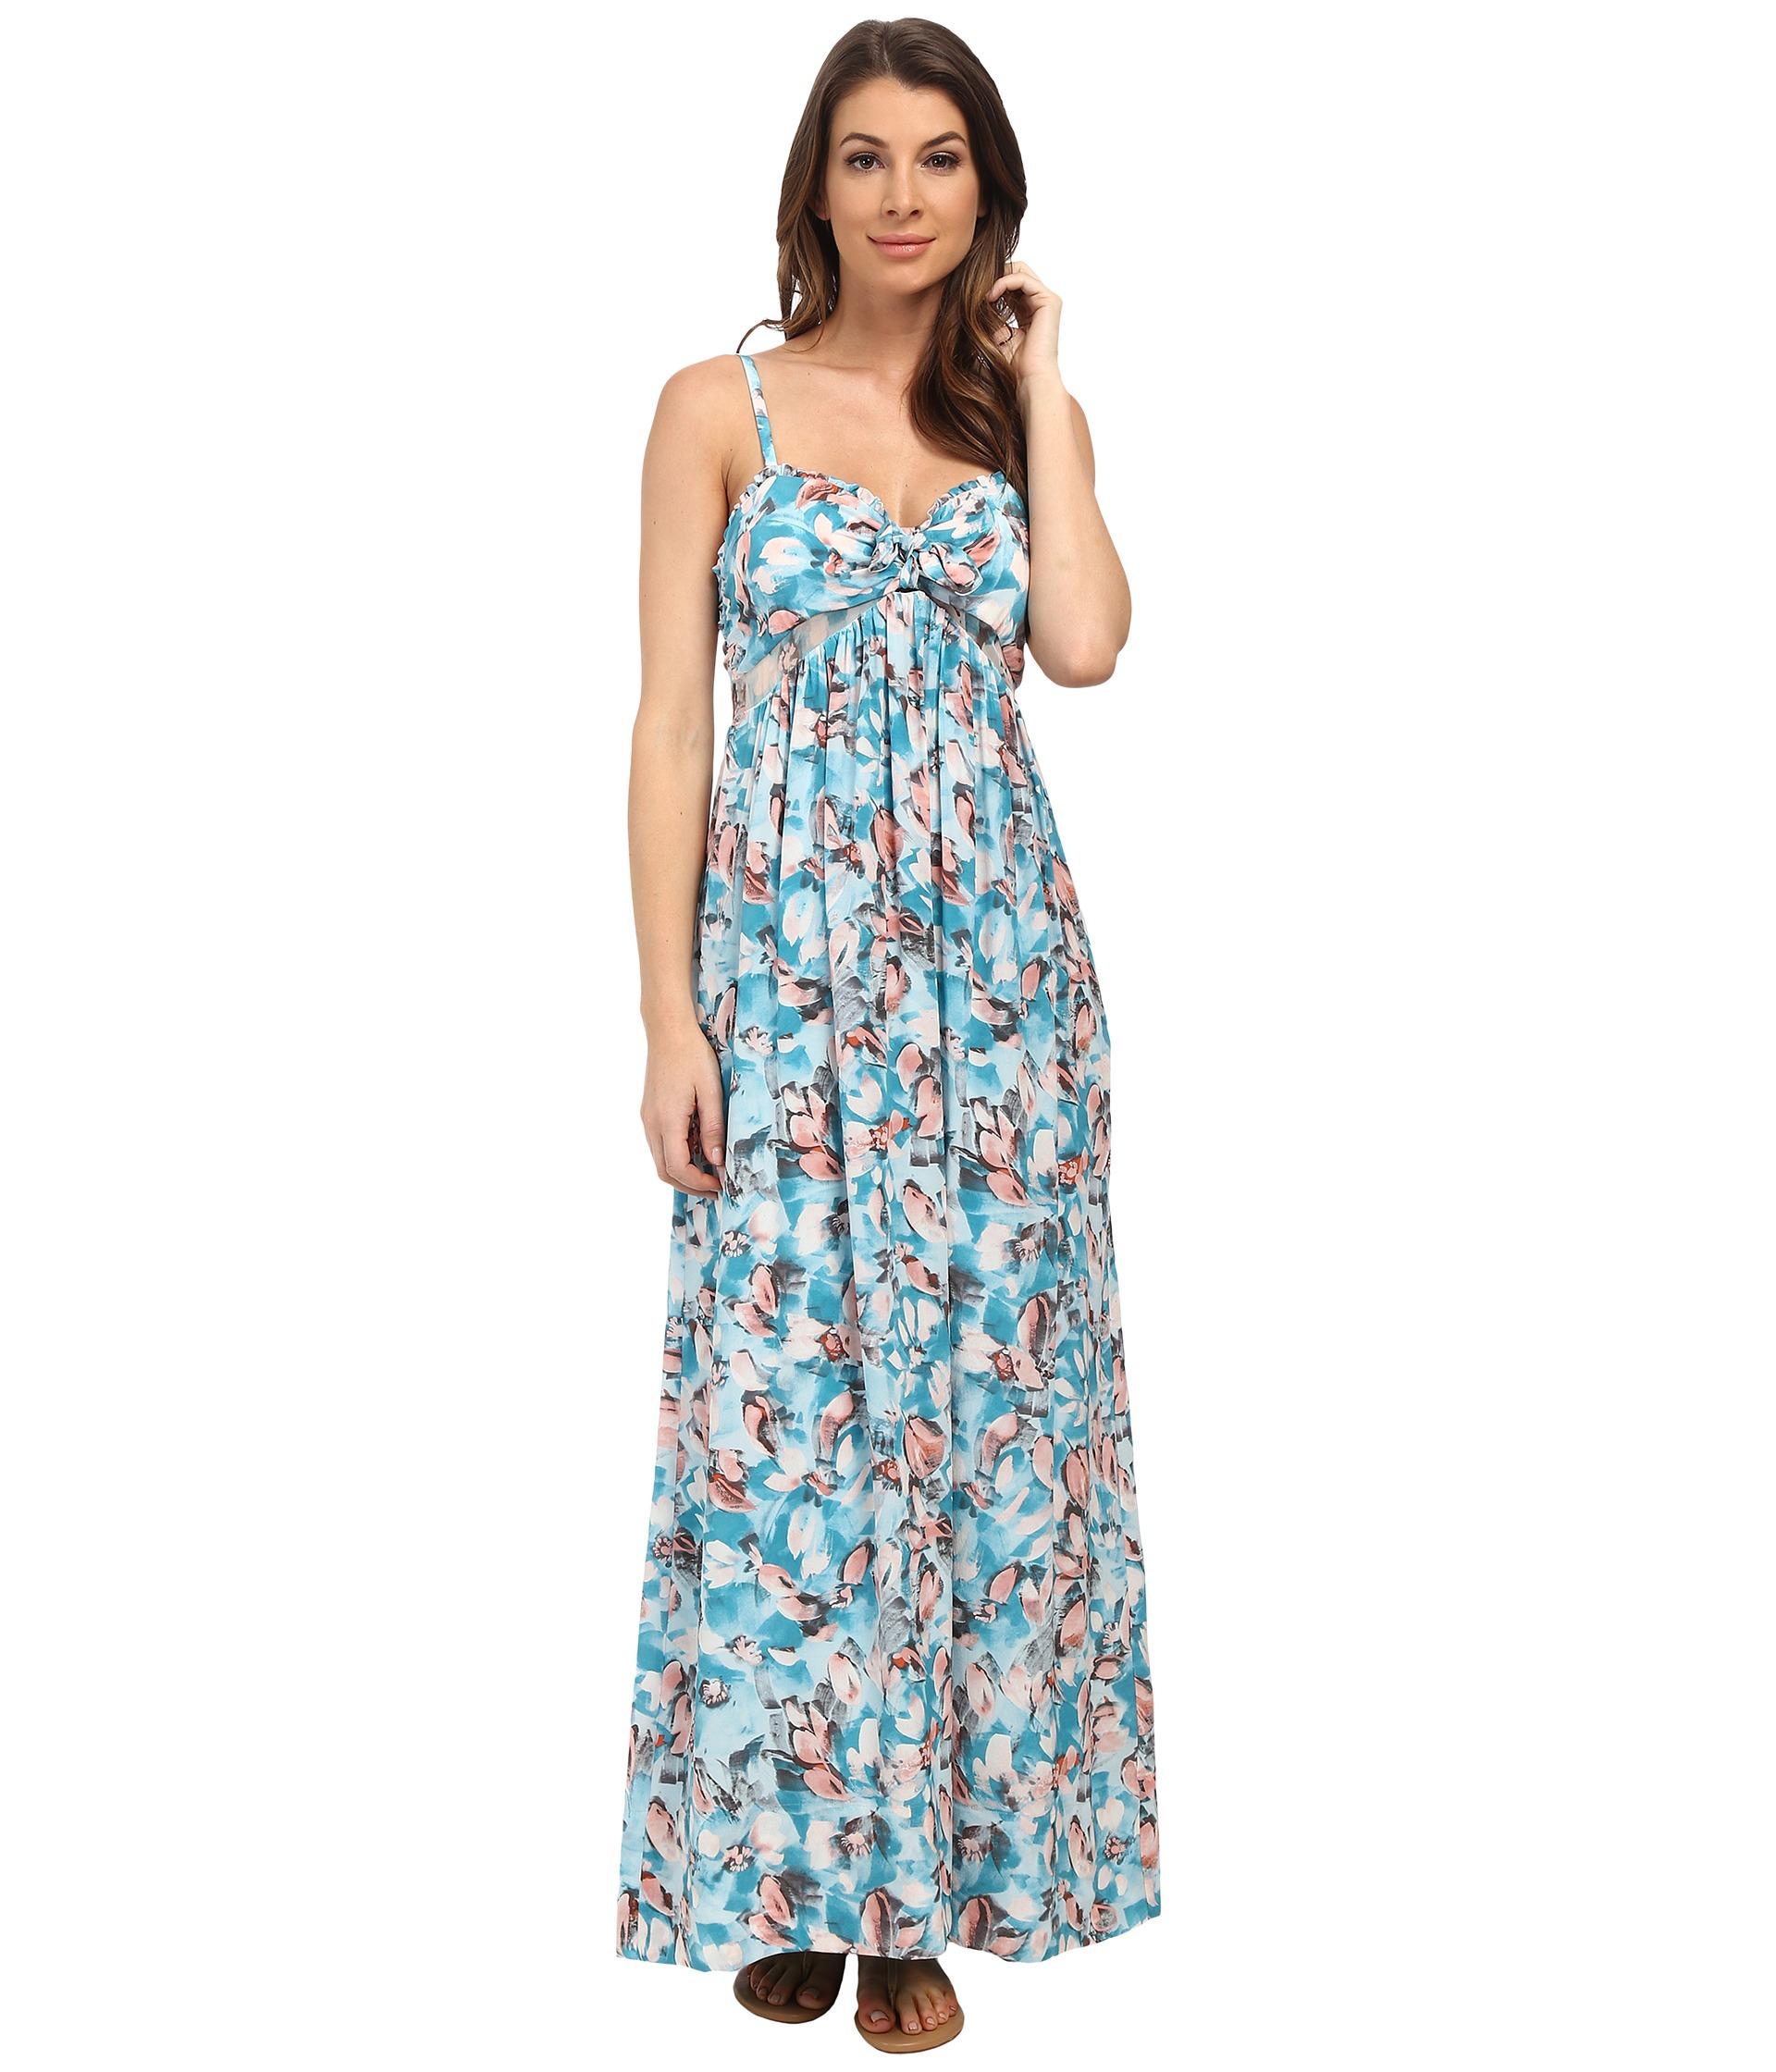 Lyst - Rebecca Taylor Sleeveless Aloha Cami Dress in Blue